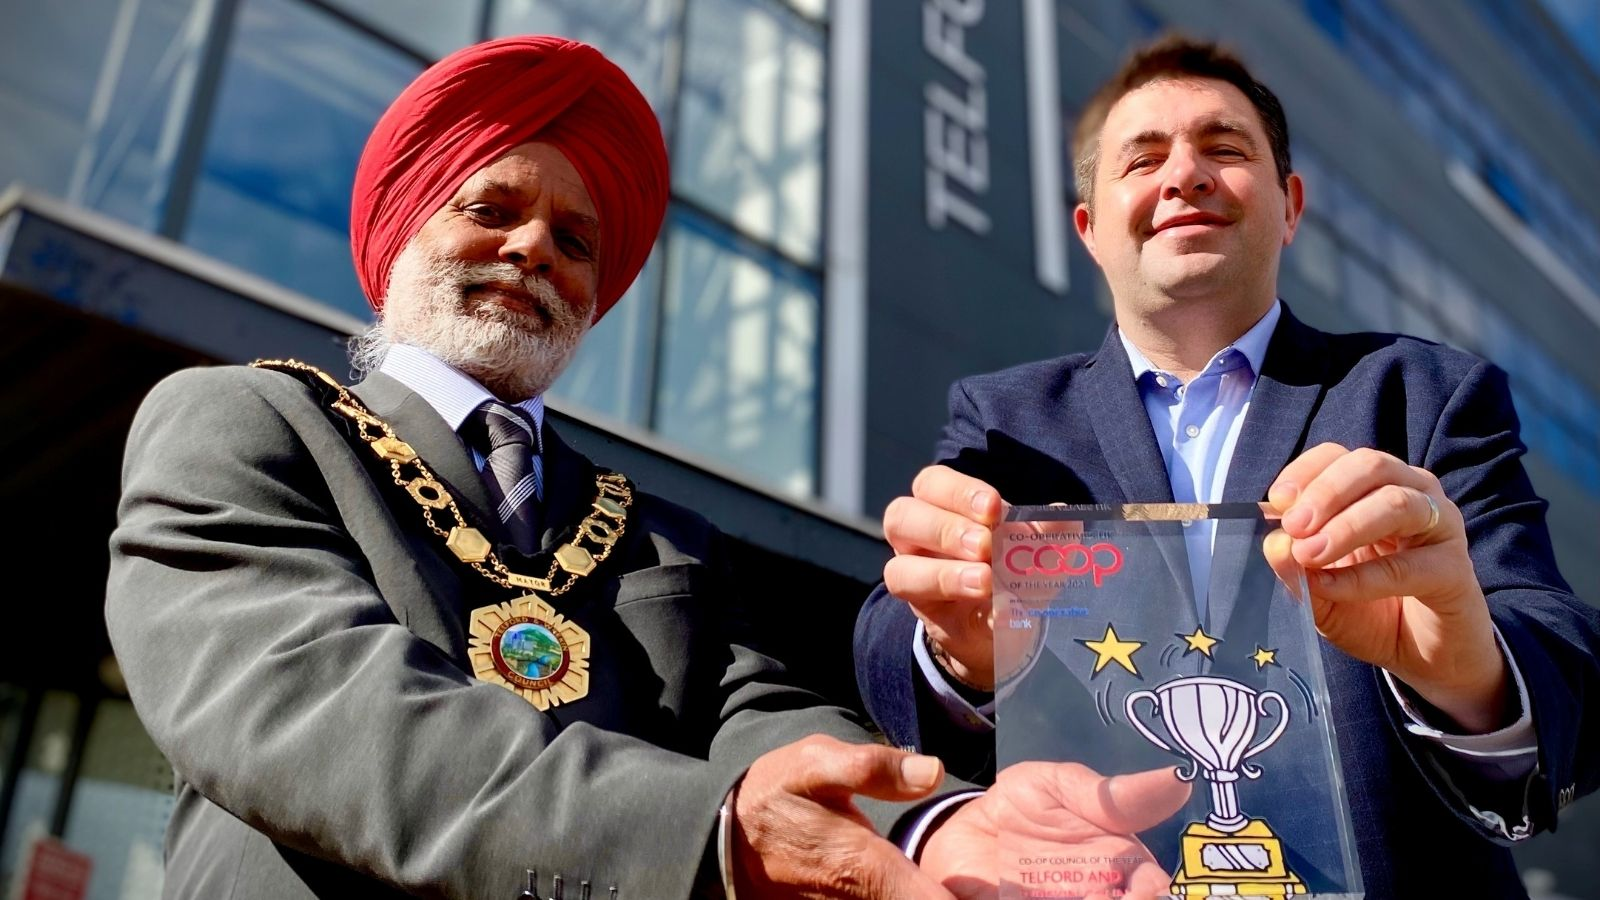 Telford and Wrekin Council celebrates Co-op of the Year Award win